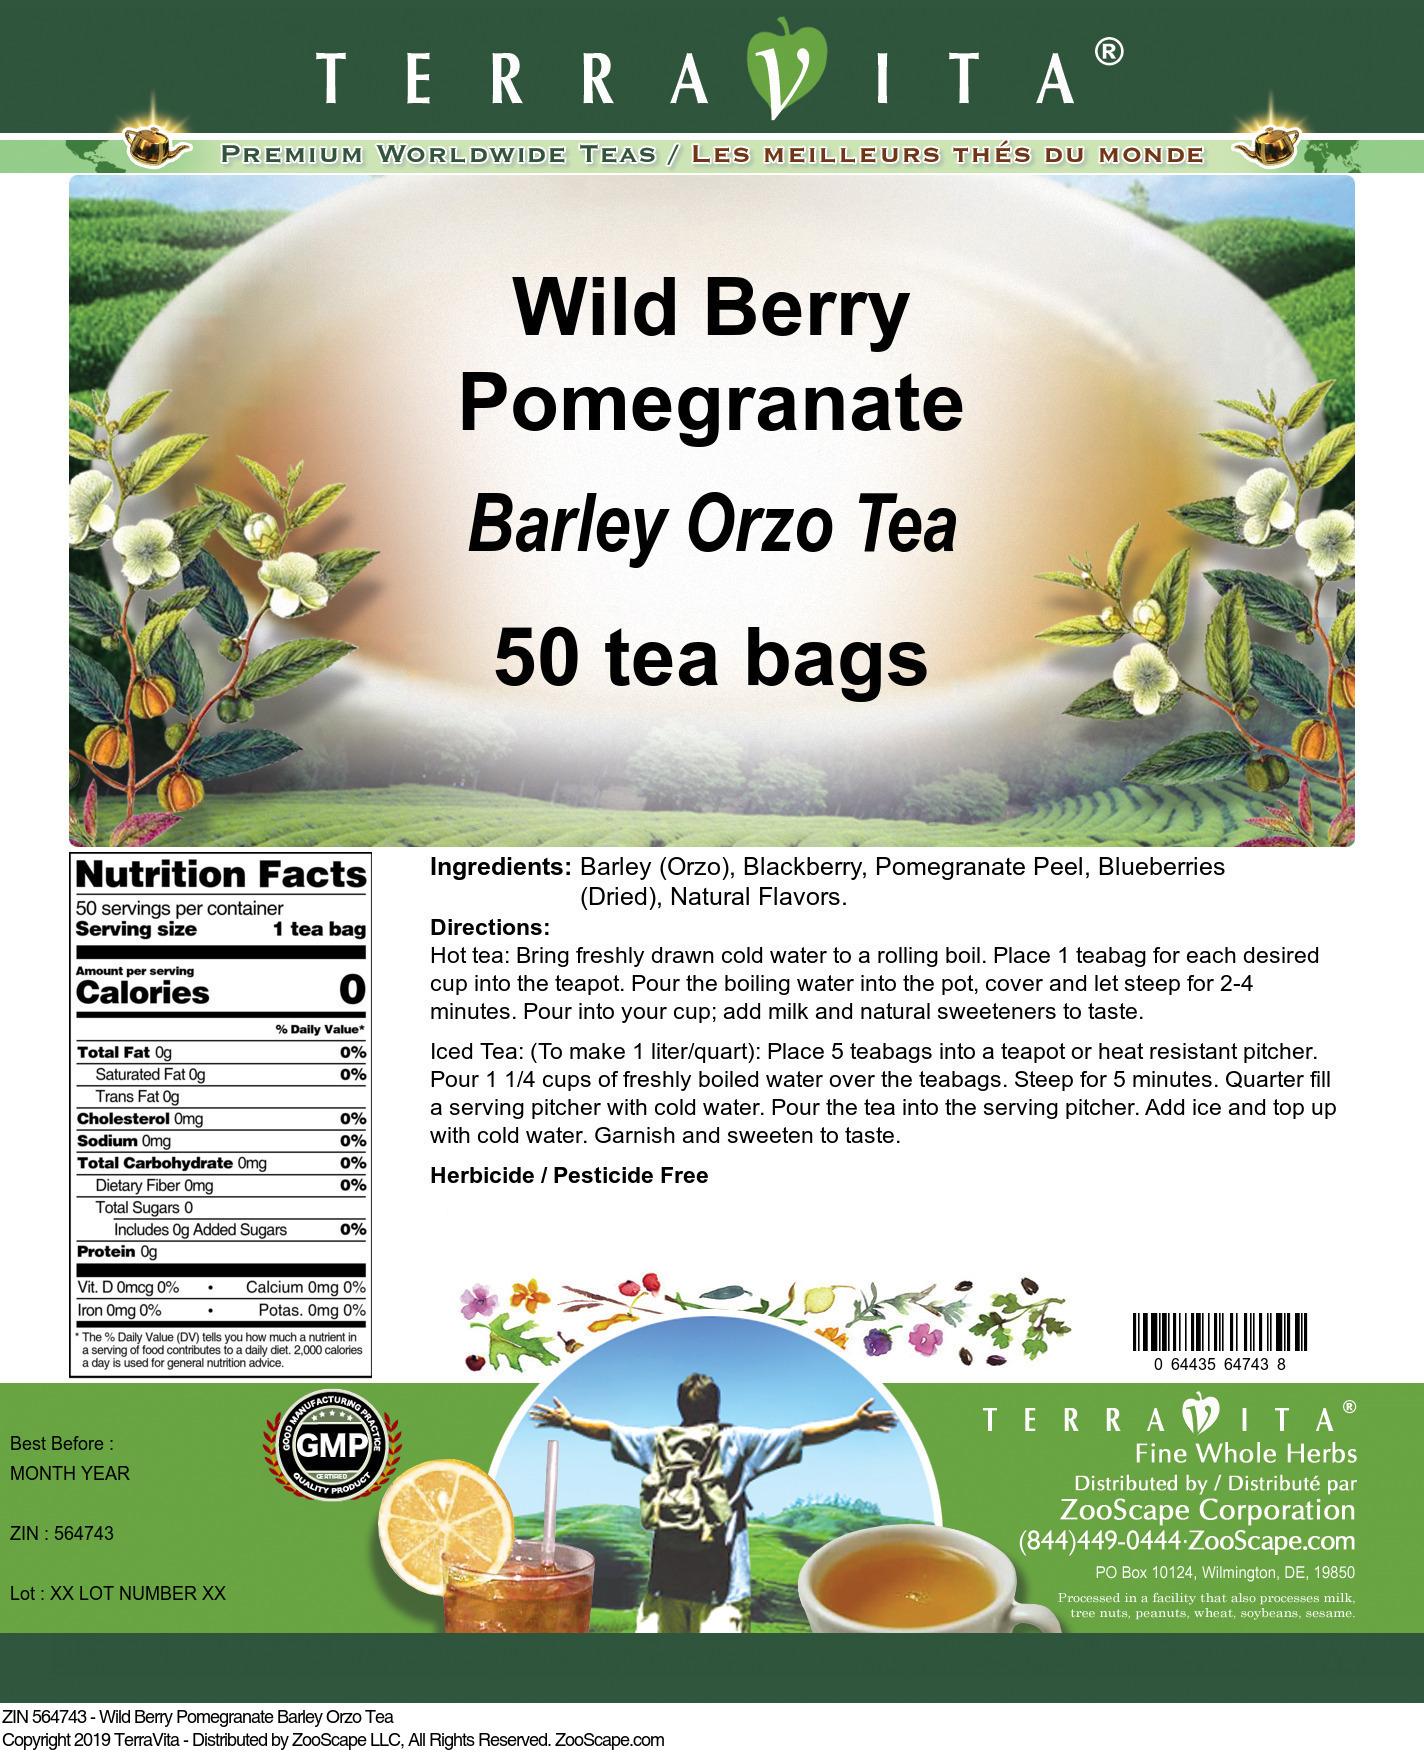 Wild Berry Pomegranate Barley Orzo